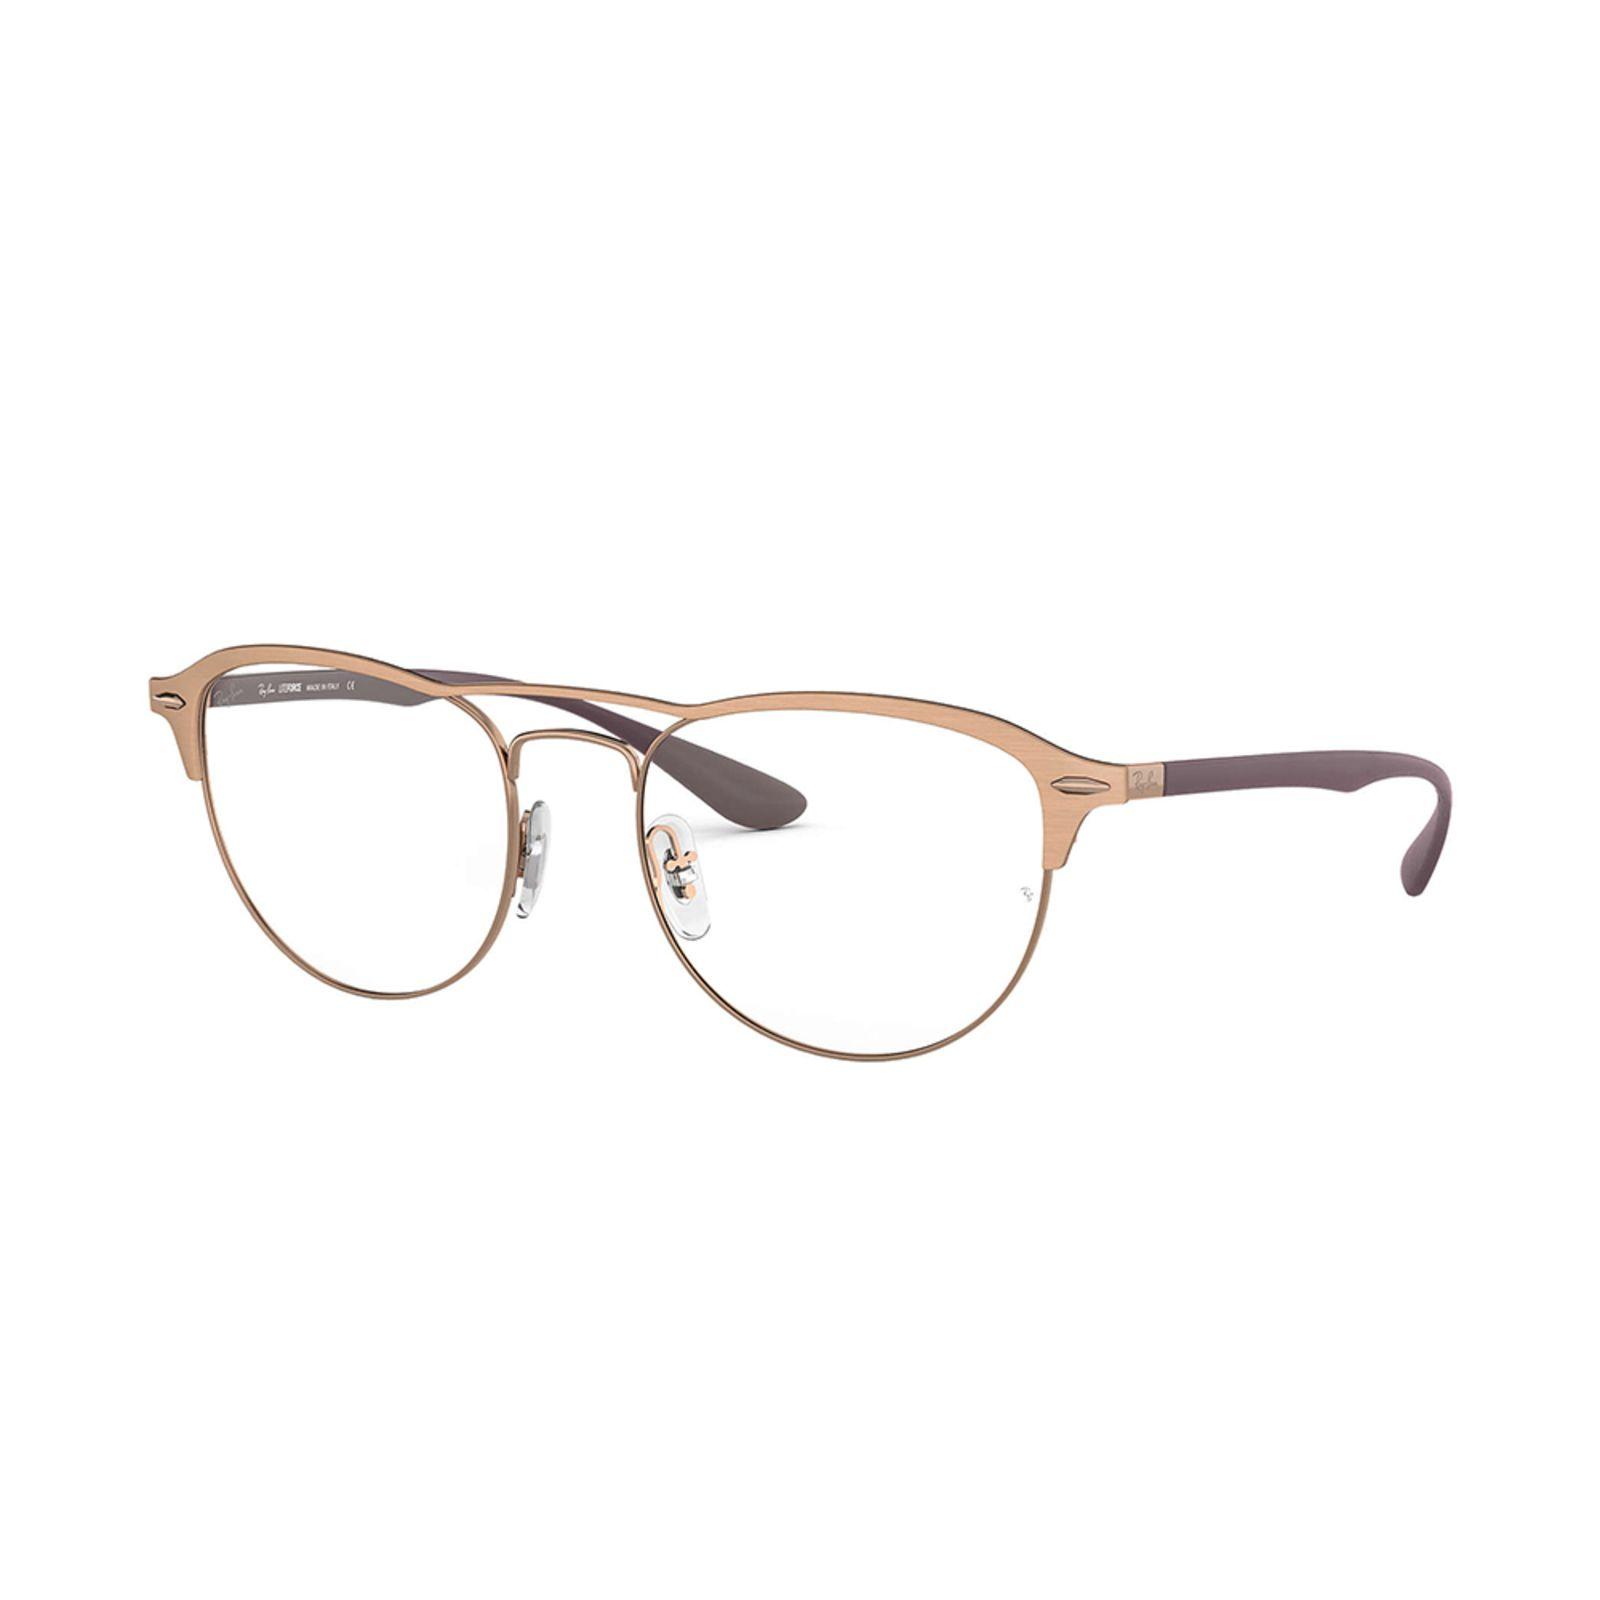 Armacao De Grau 0rx3596v Ray Ban Brasil Oculos Estilosos